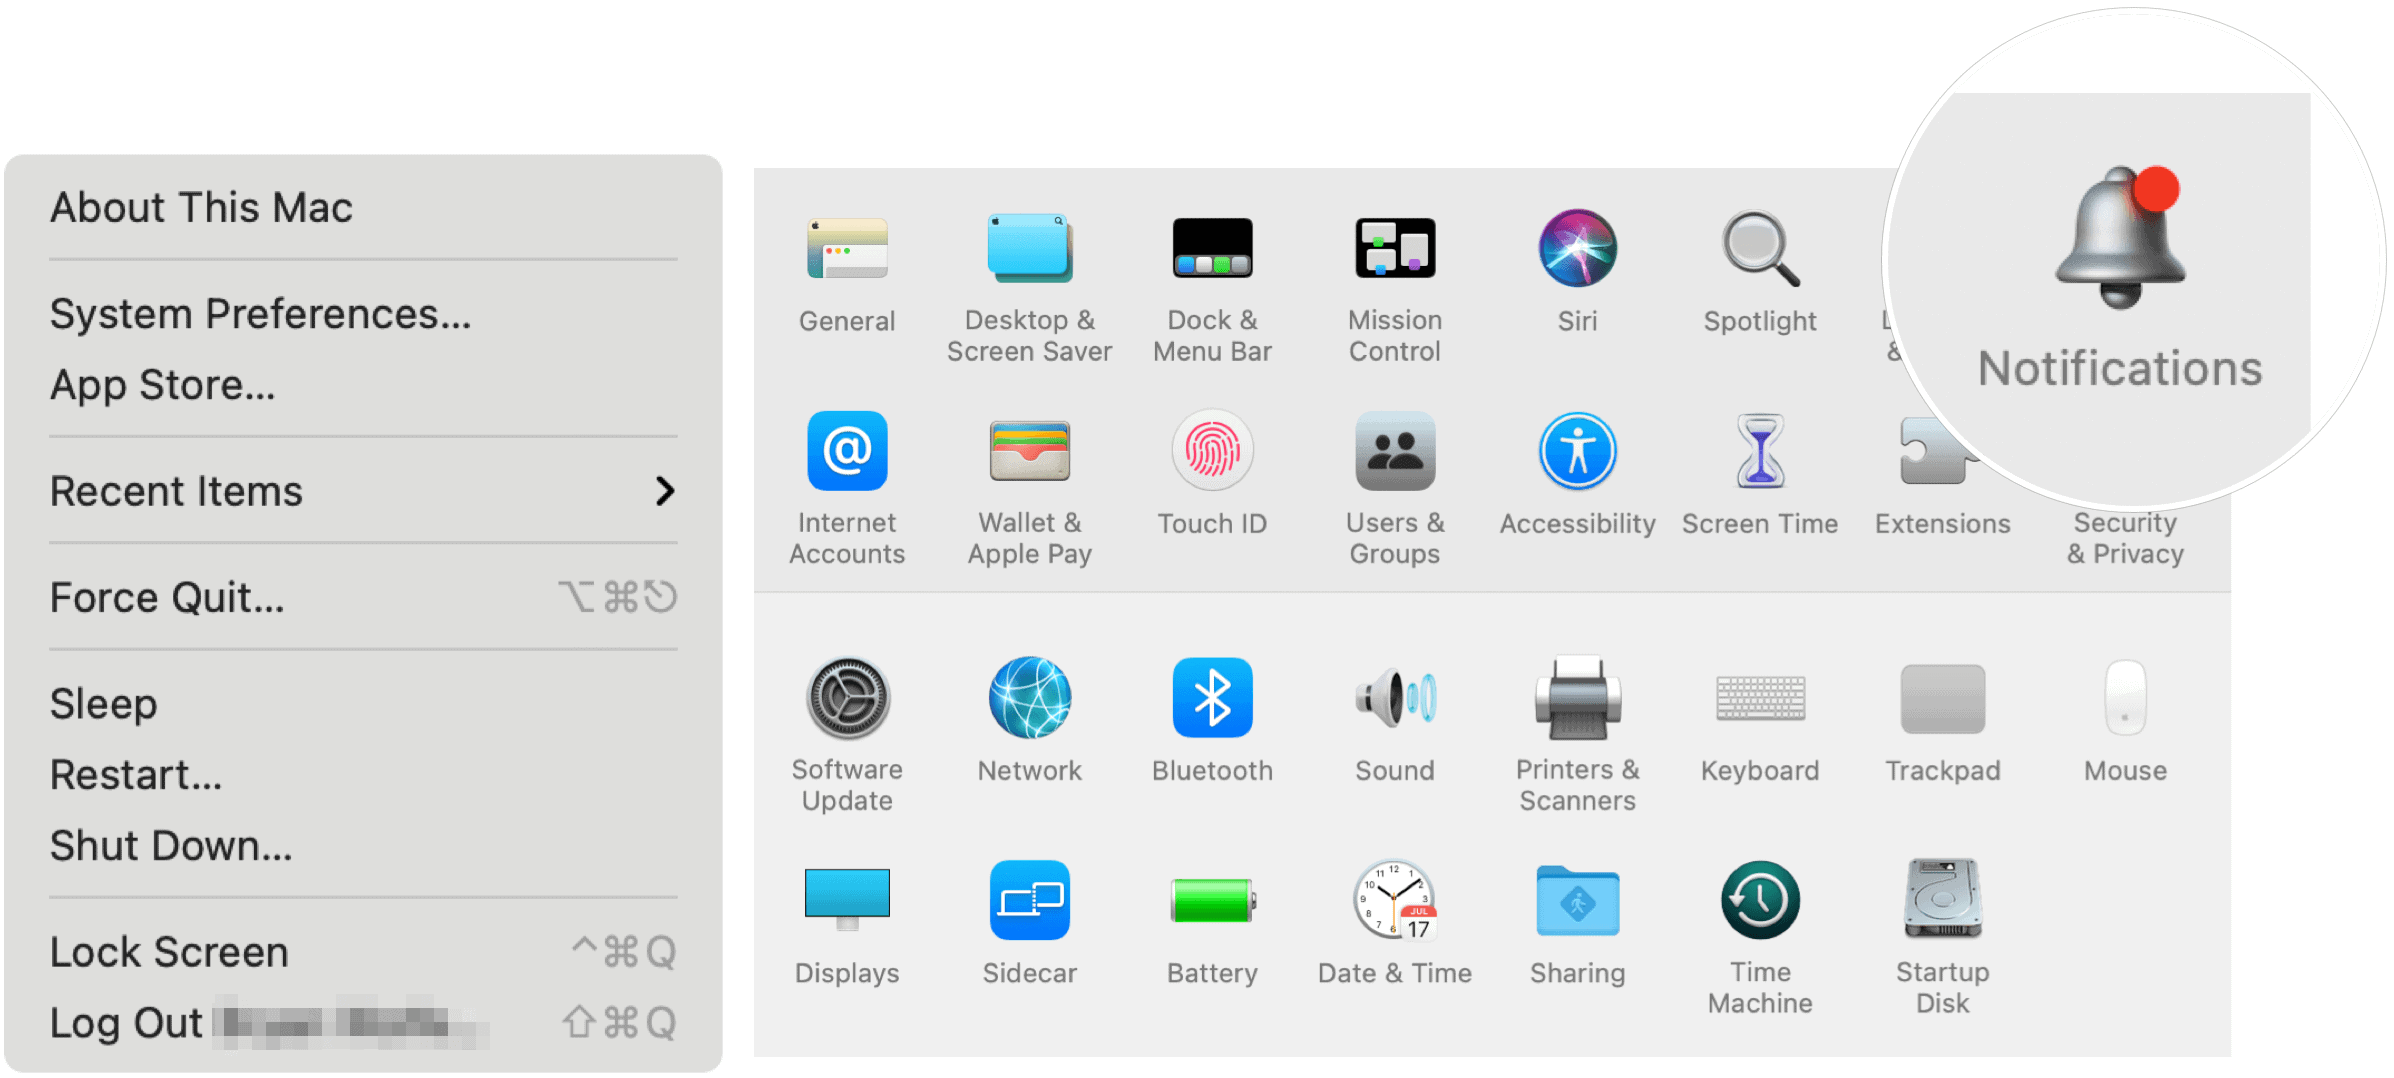 Notifications on Mac